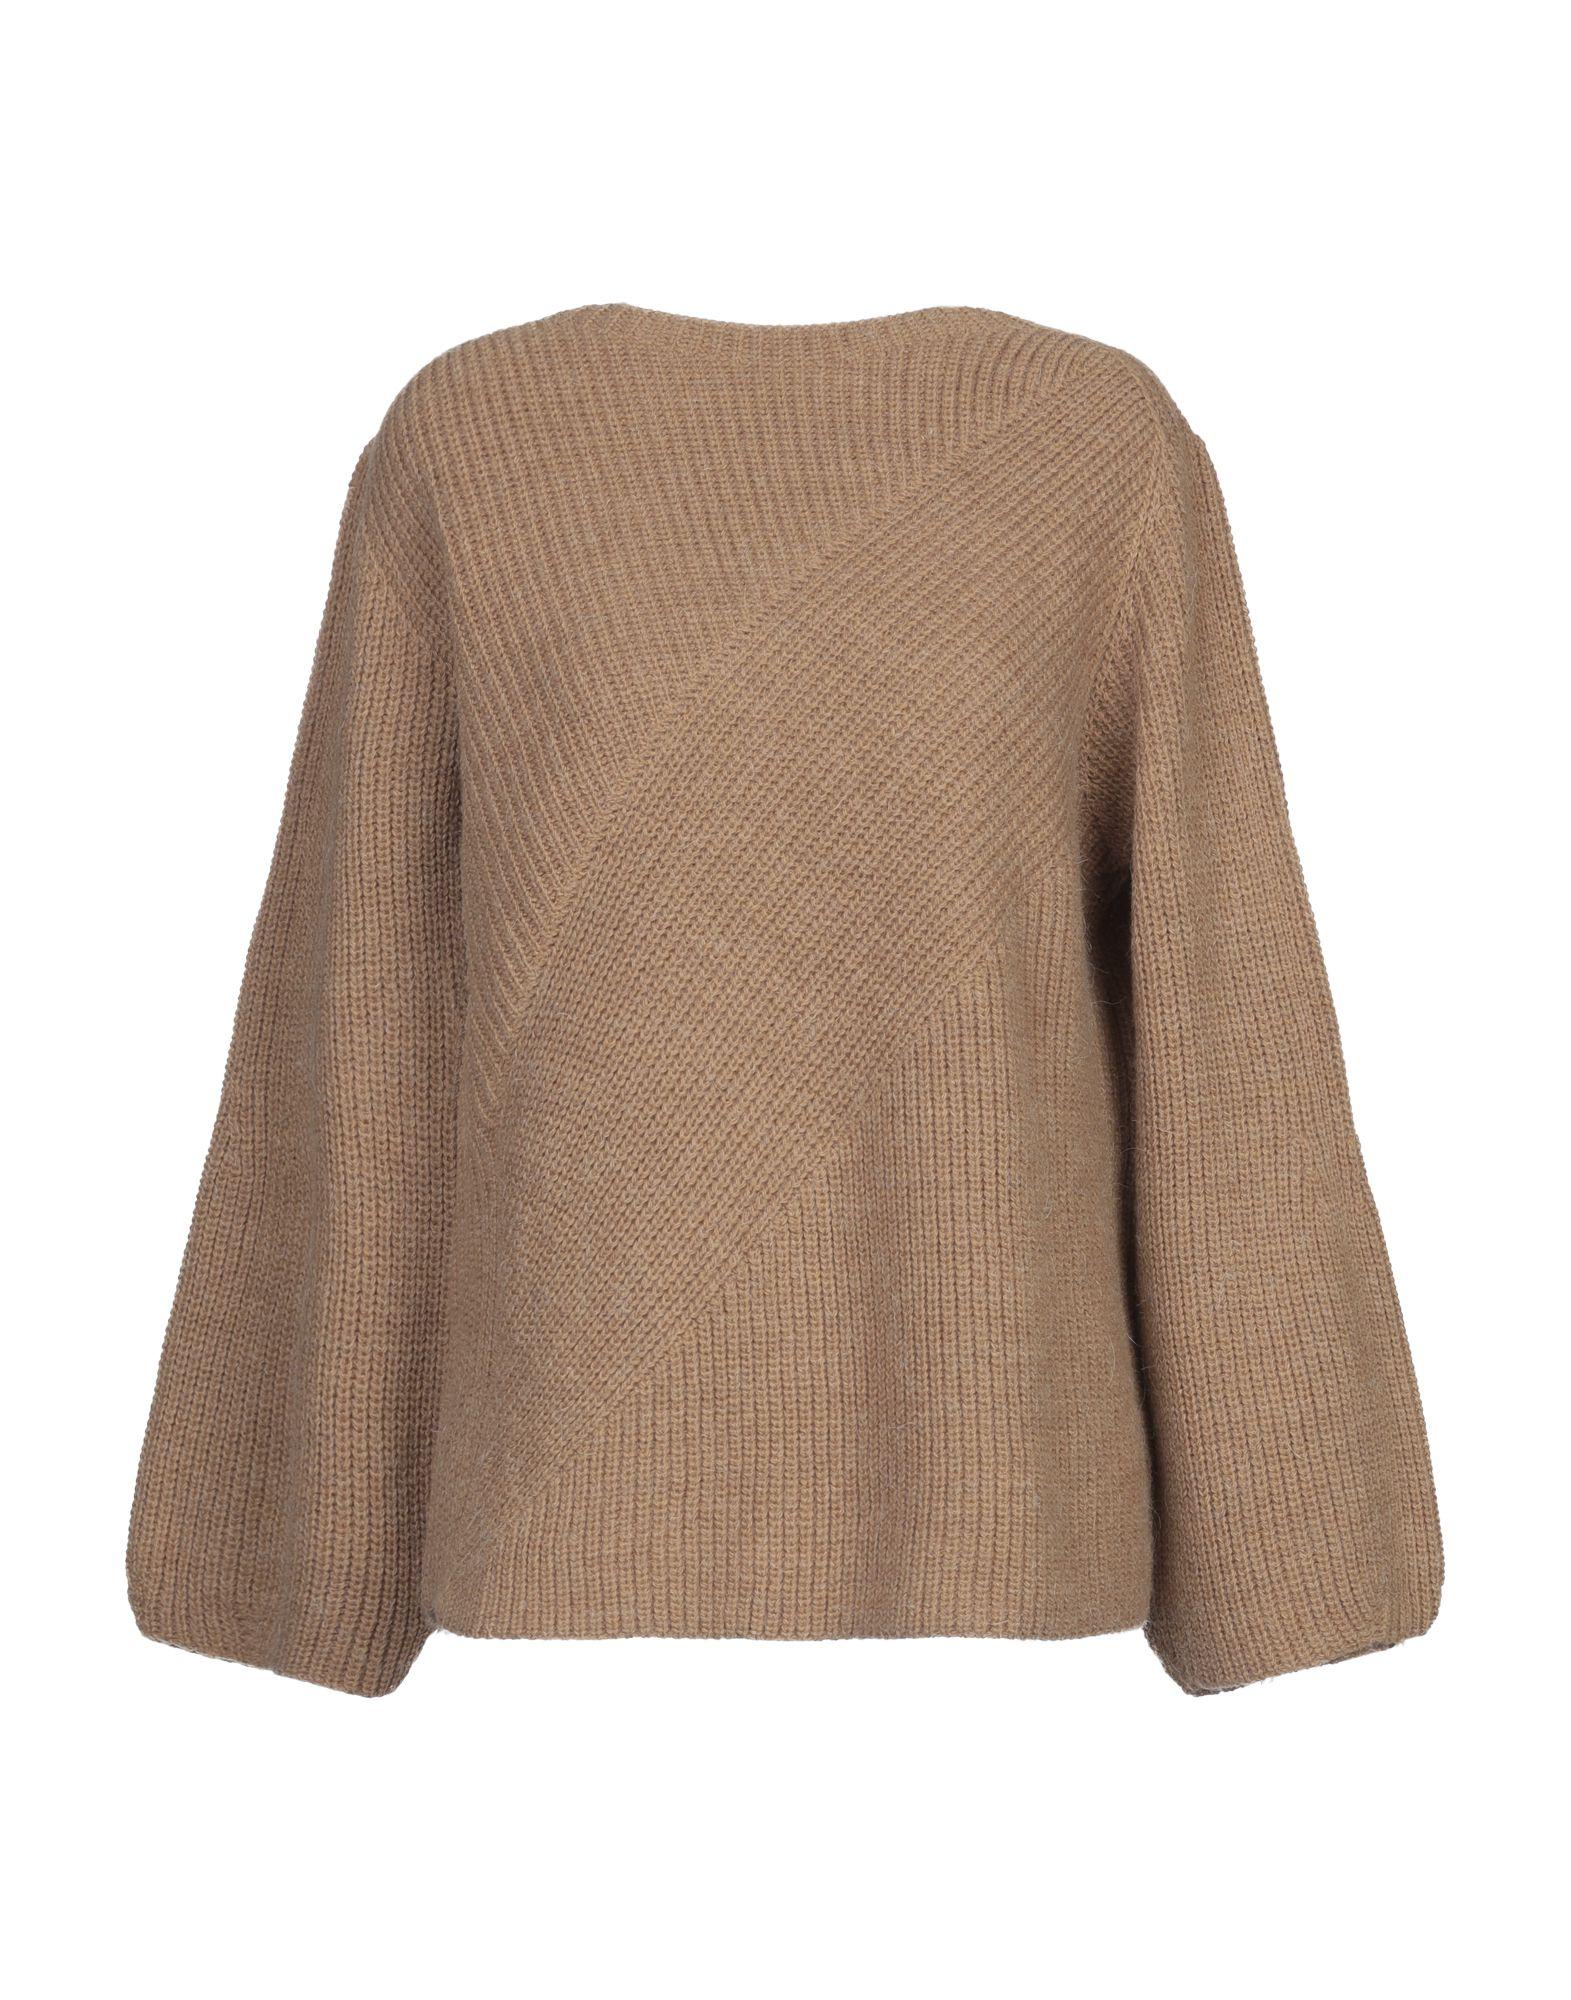 HOPE COLLECTION Свитер hope 1967 свитер